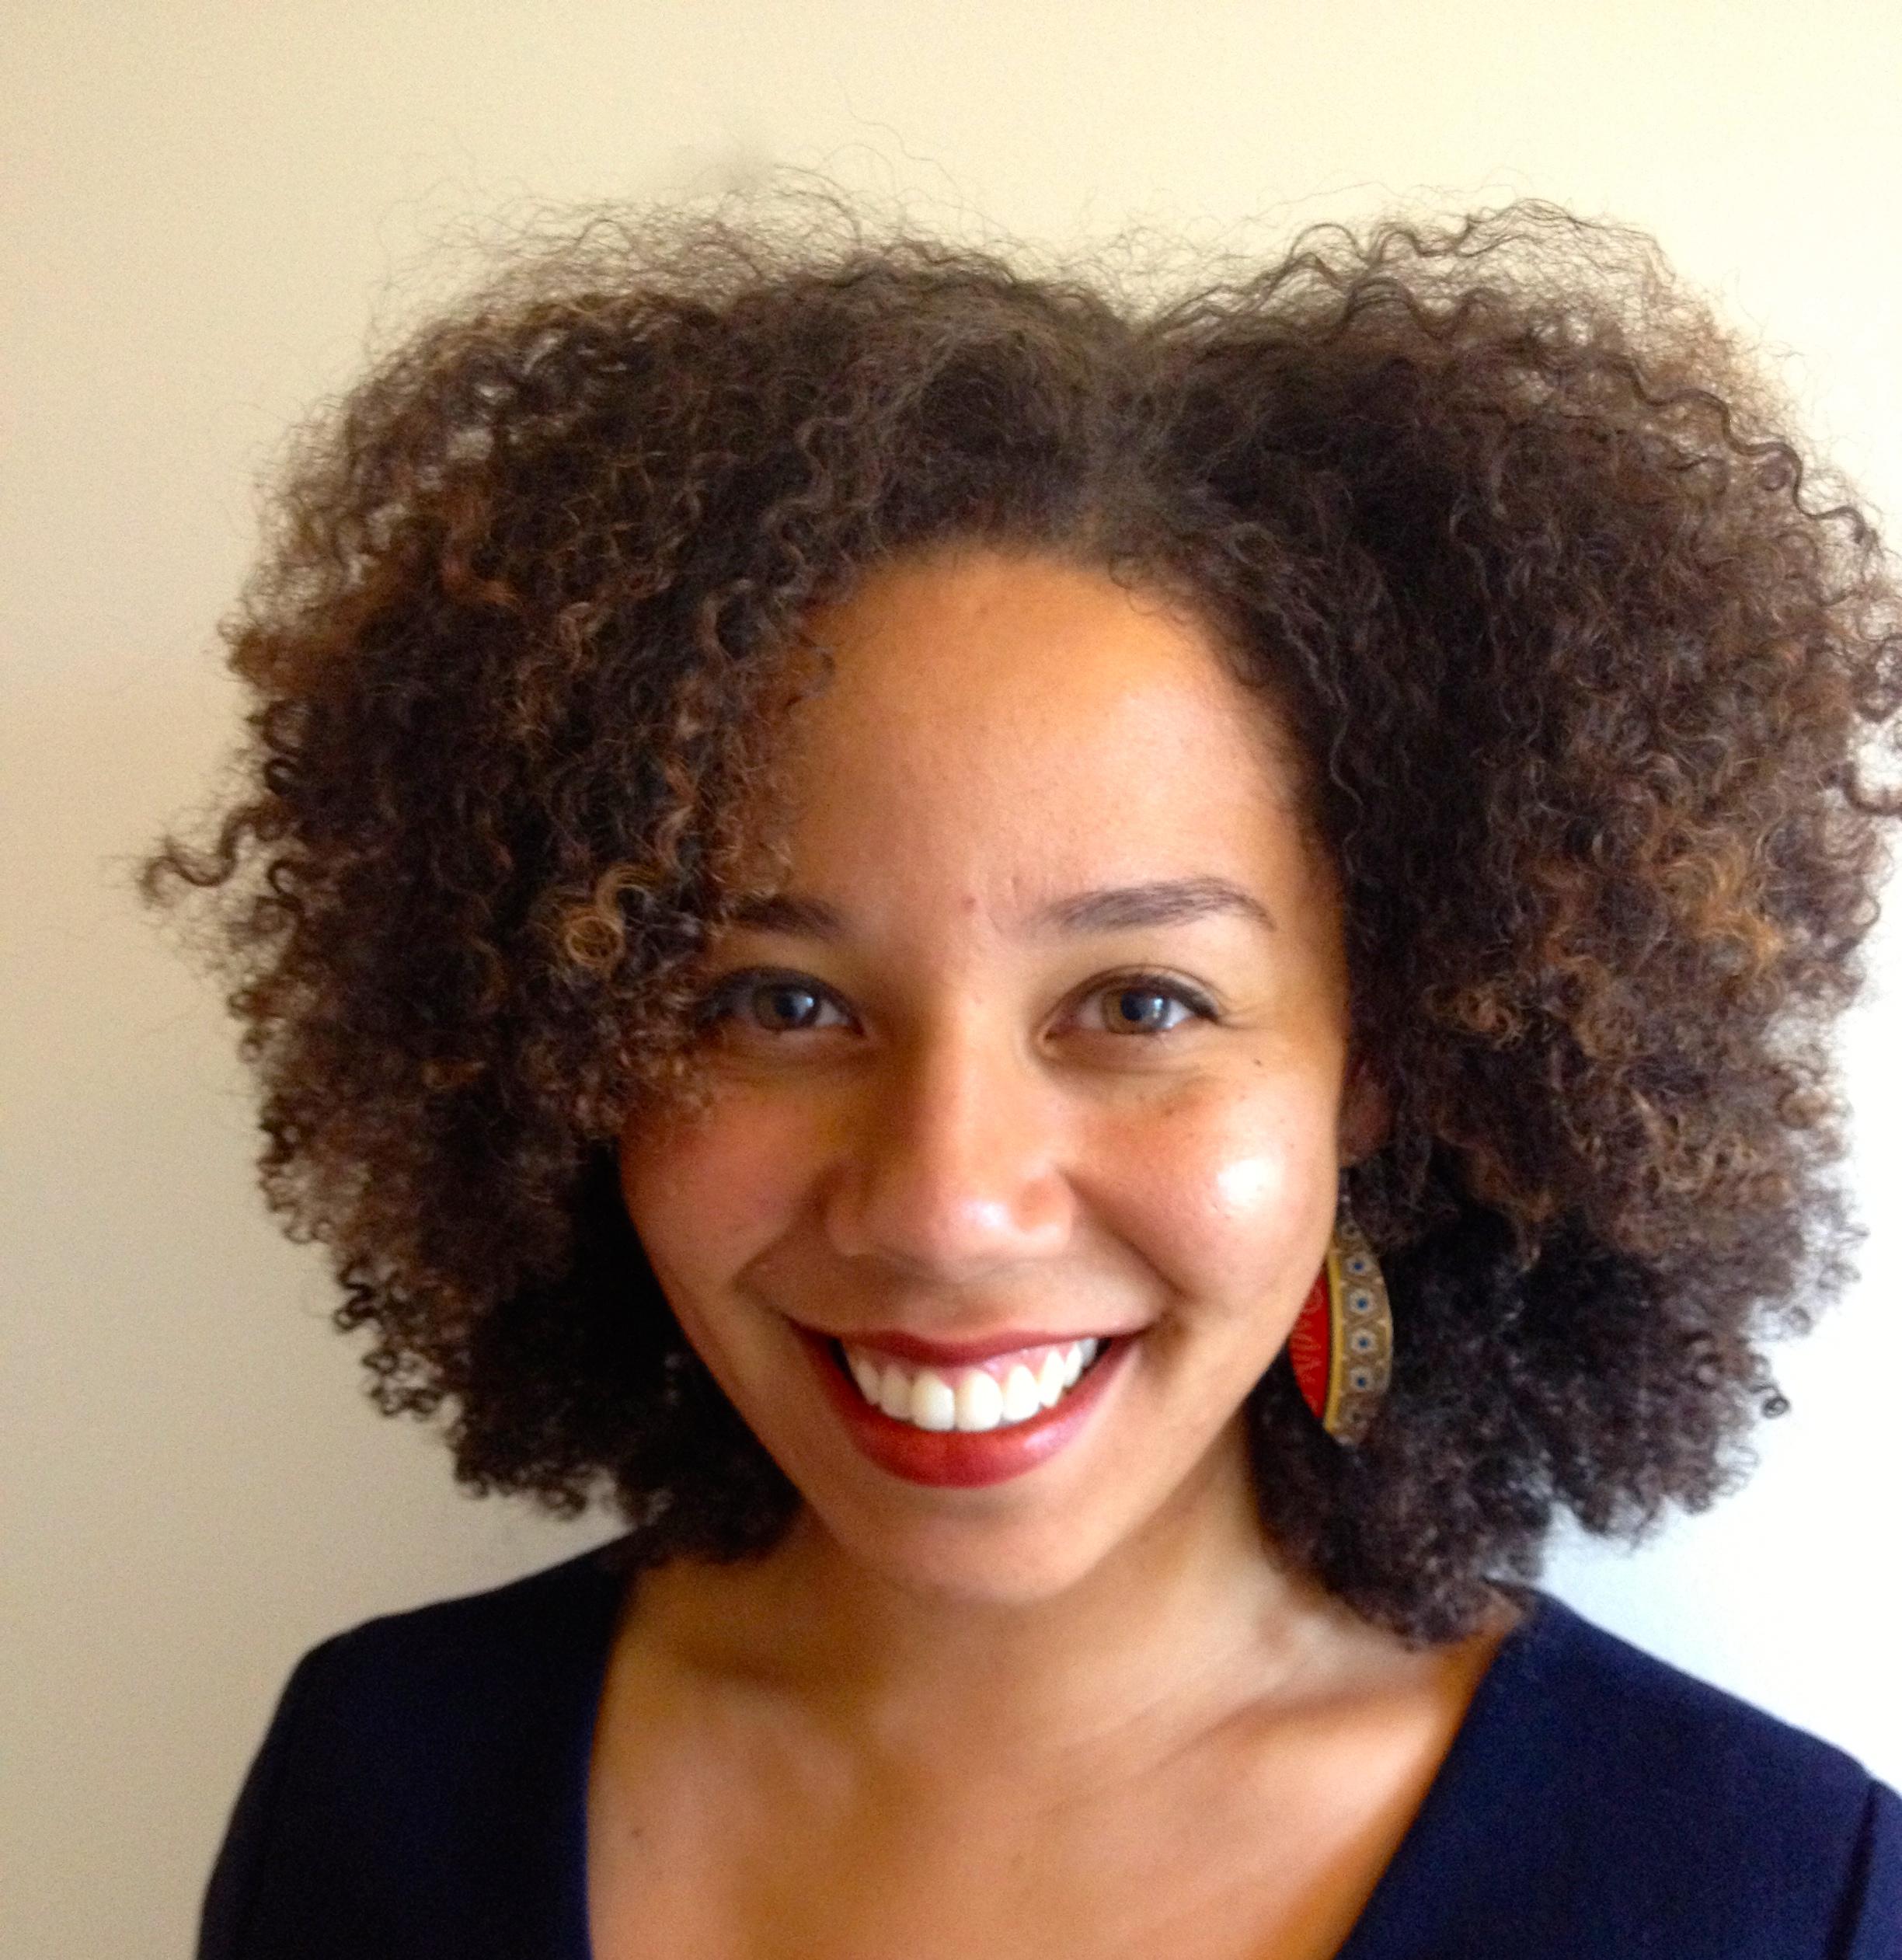 Amanda Alexander, Attorney, Michigan Law - Child Advocacy Law Clinic